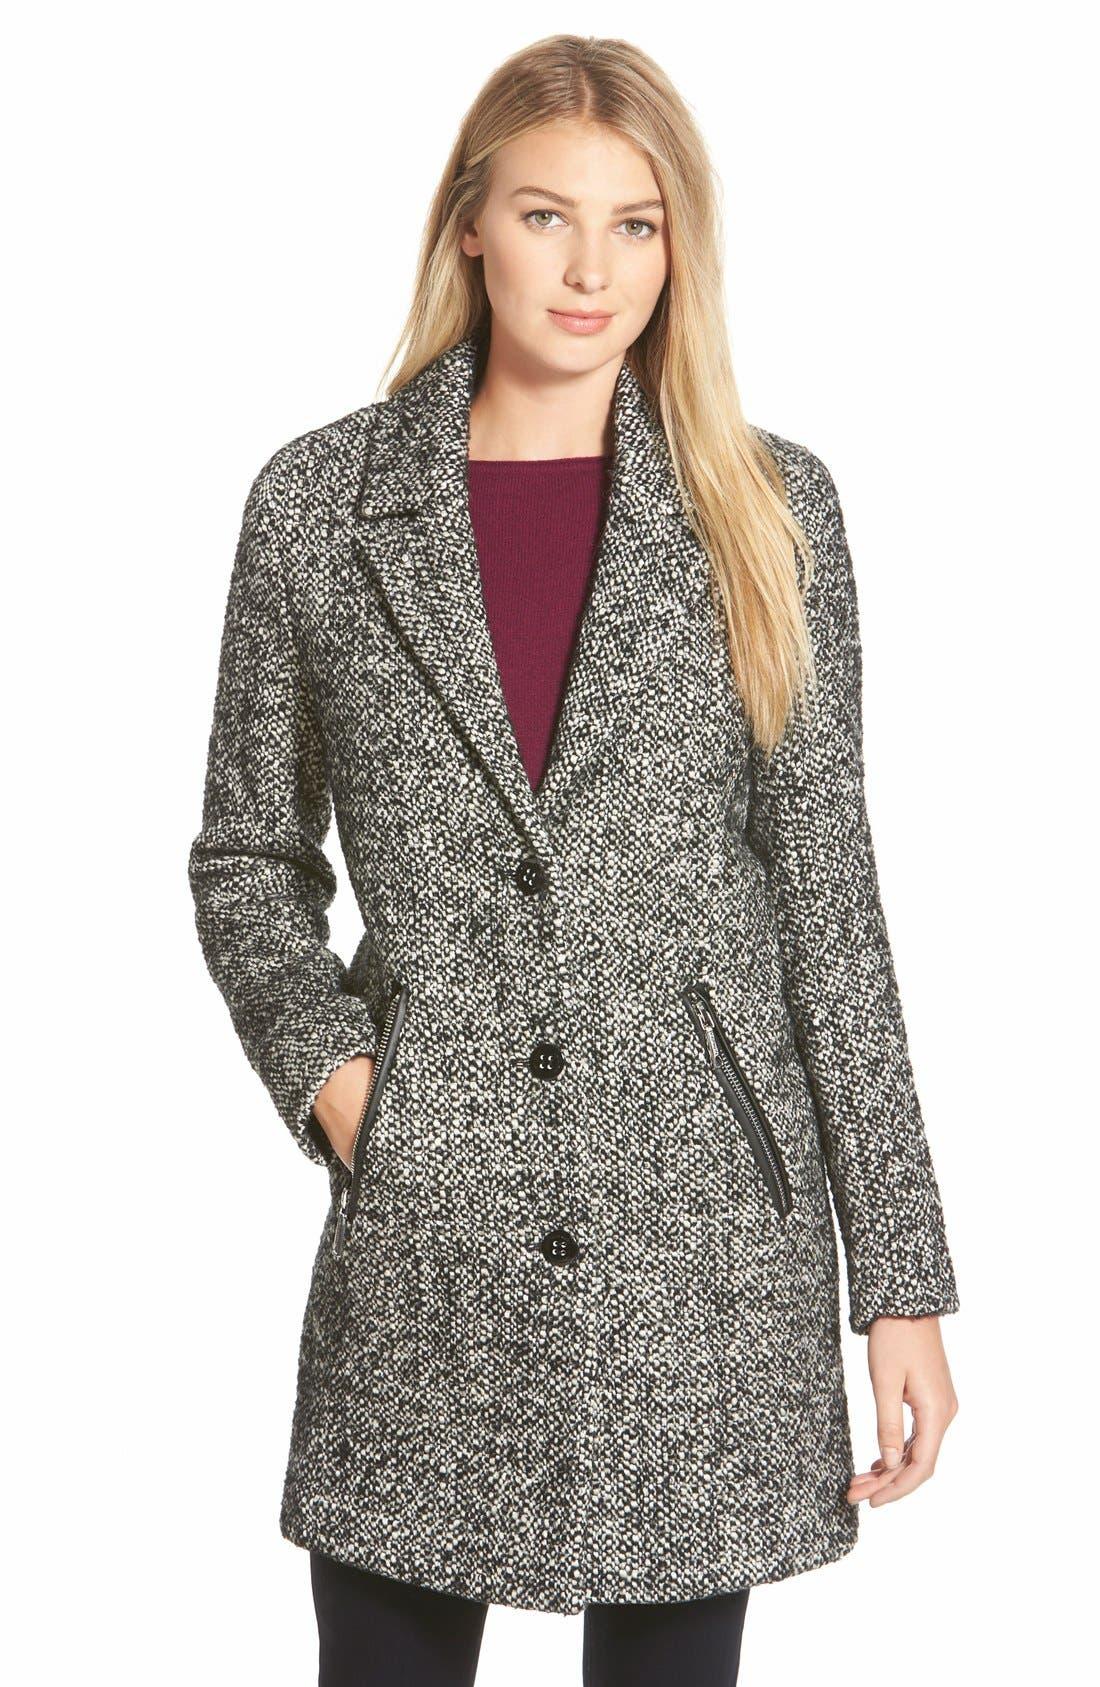 Tweed Walking Coat,                             Main thumbnail 1, color,                             081